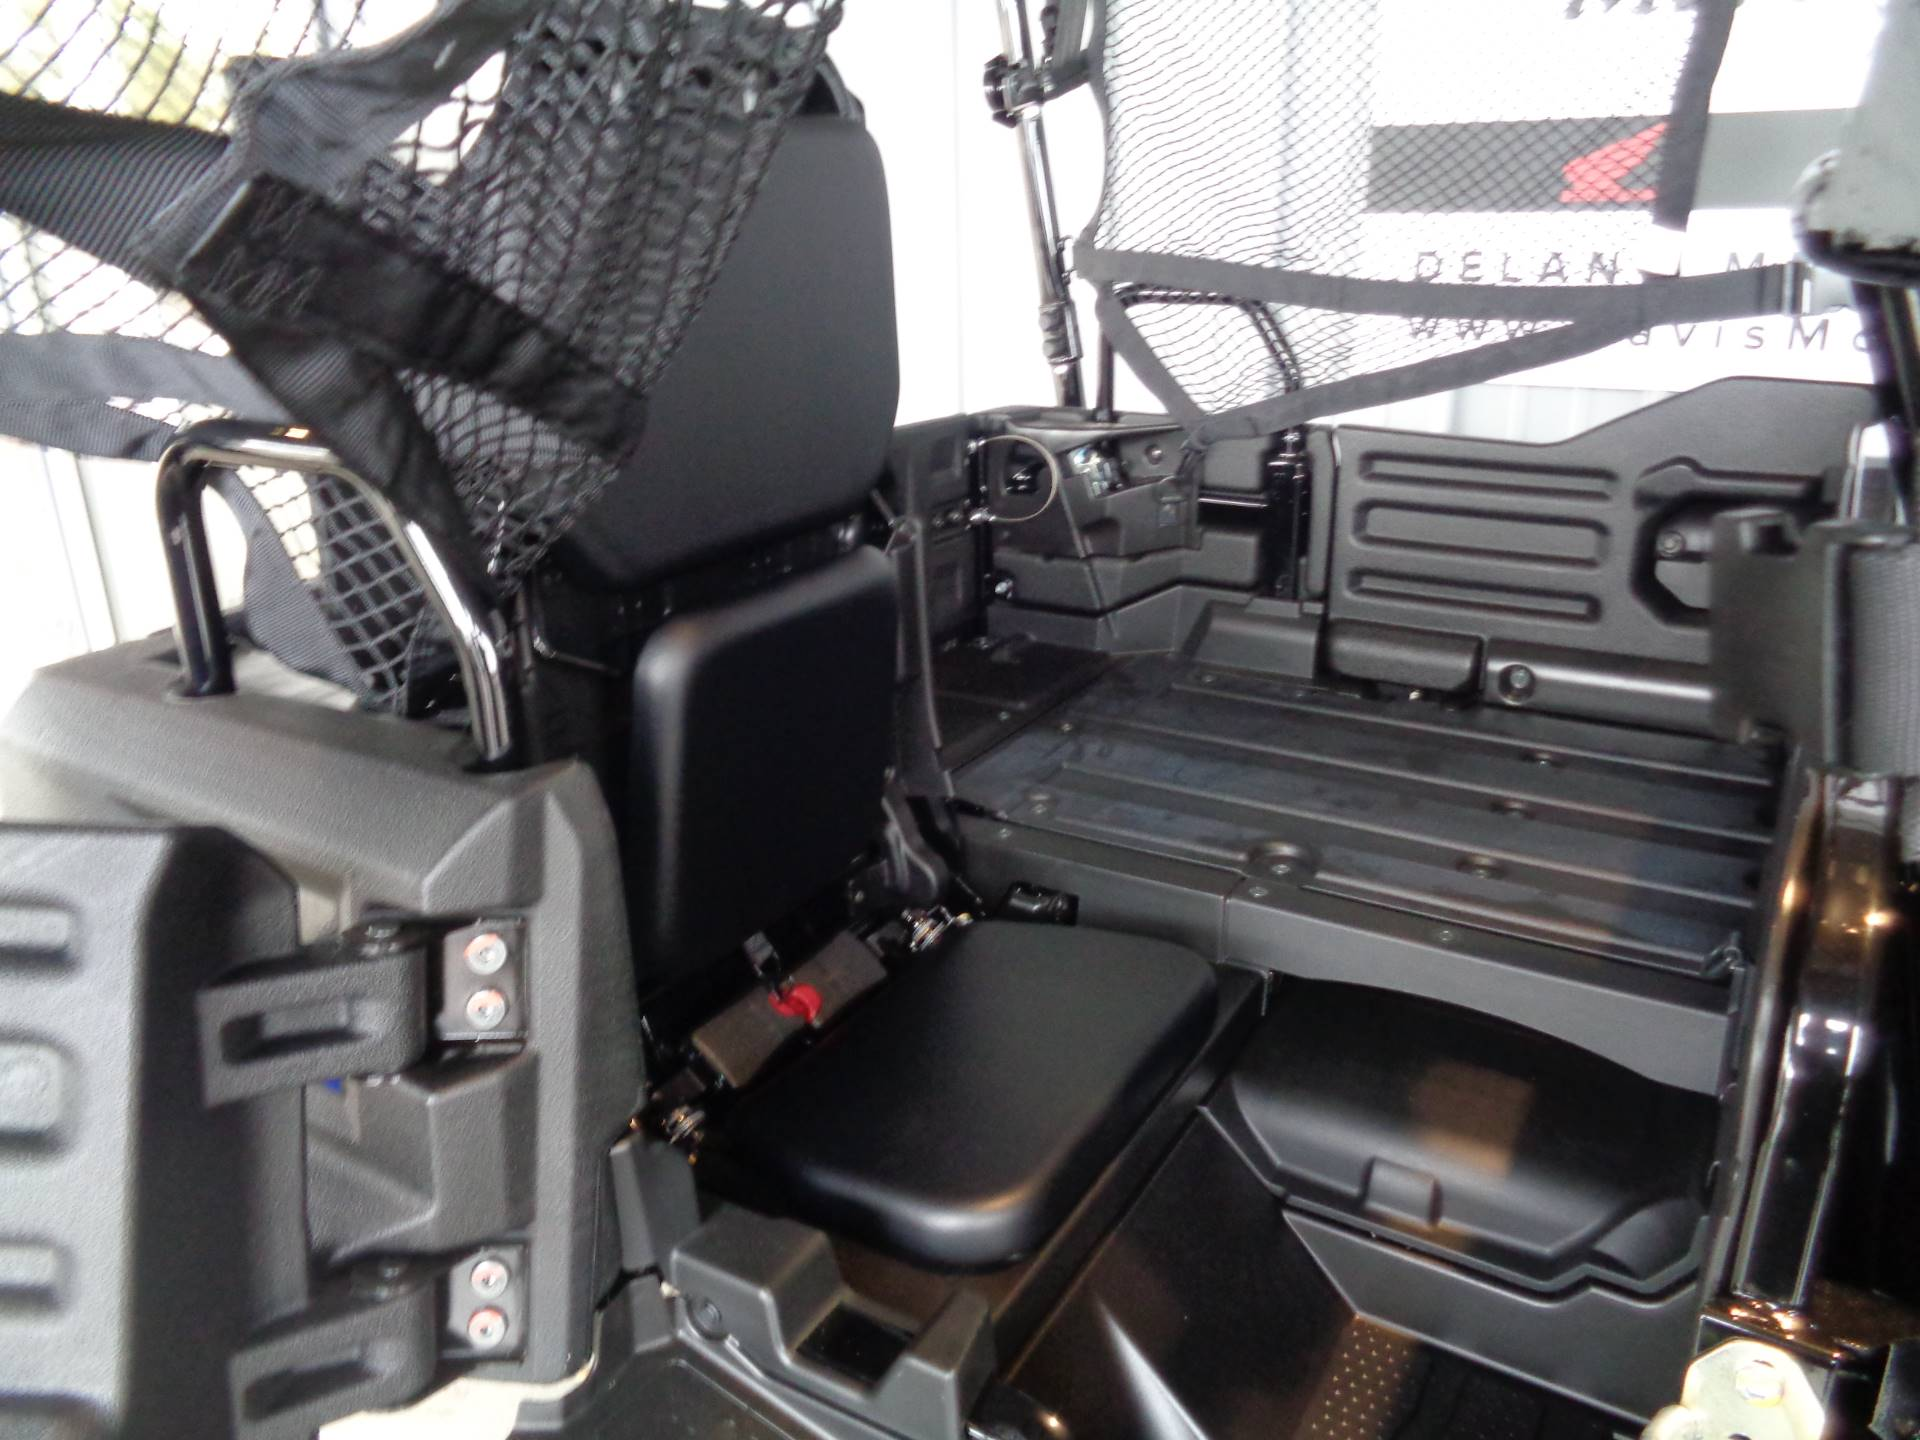 2019 Honda Pioneer 700-4 Deluxe 8